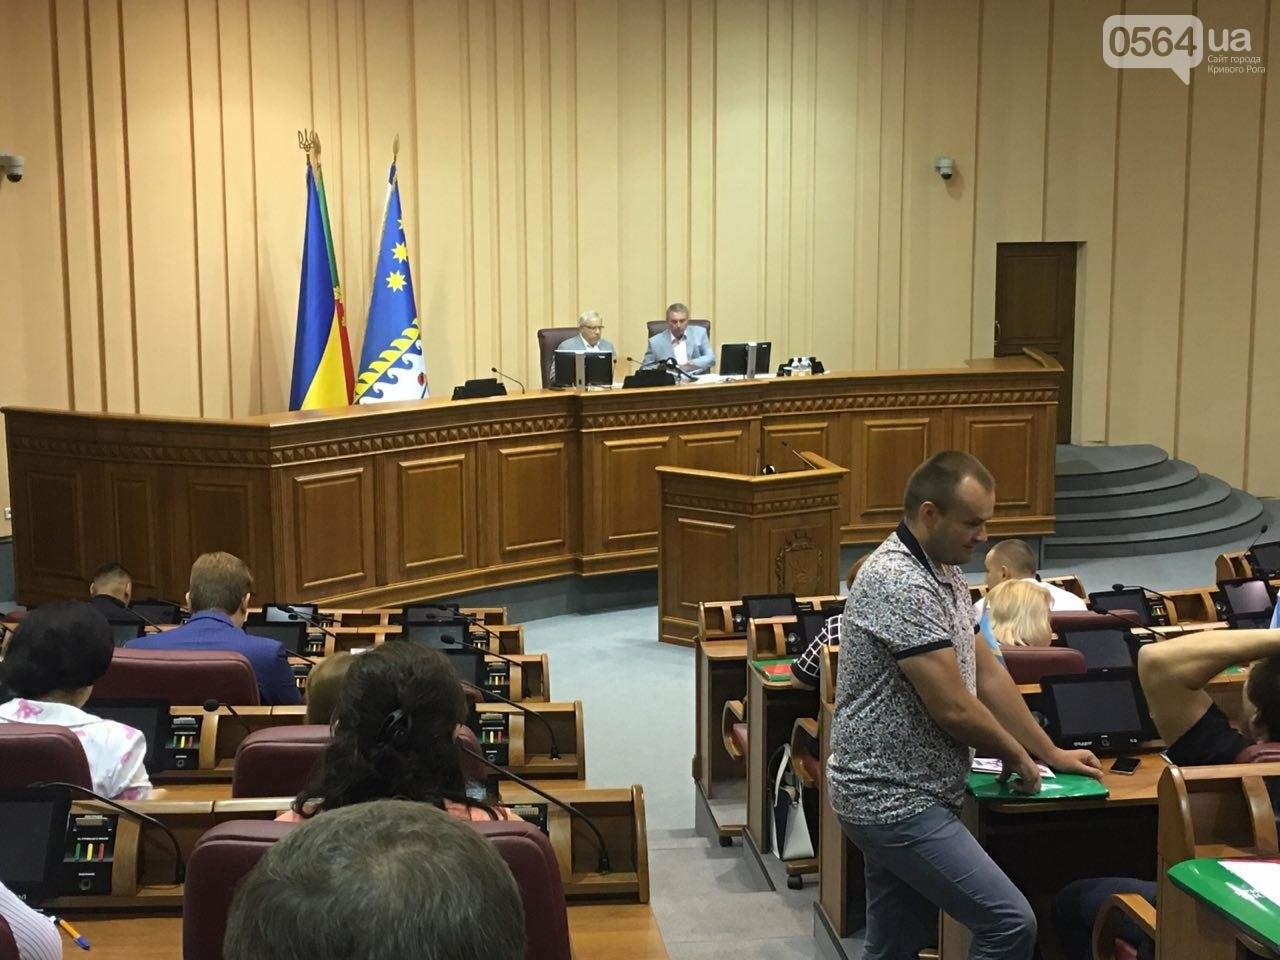 Криворожский горсовет не поддержал петицию о запрете Марша равенства, - ФОТО, фото-13